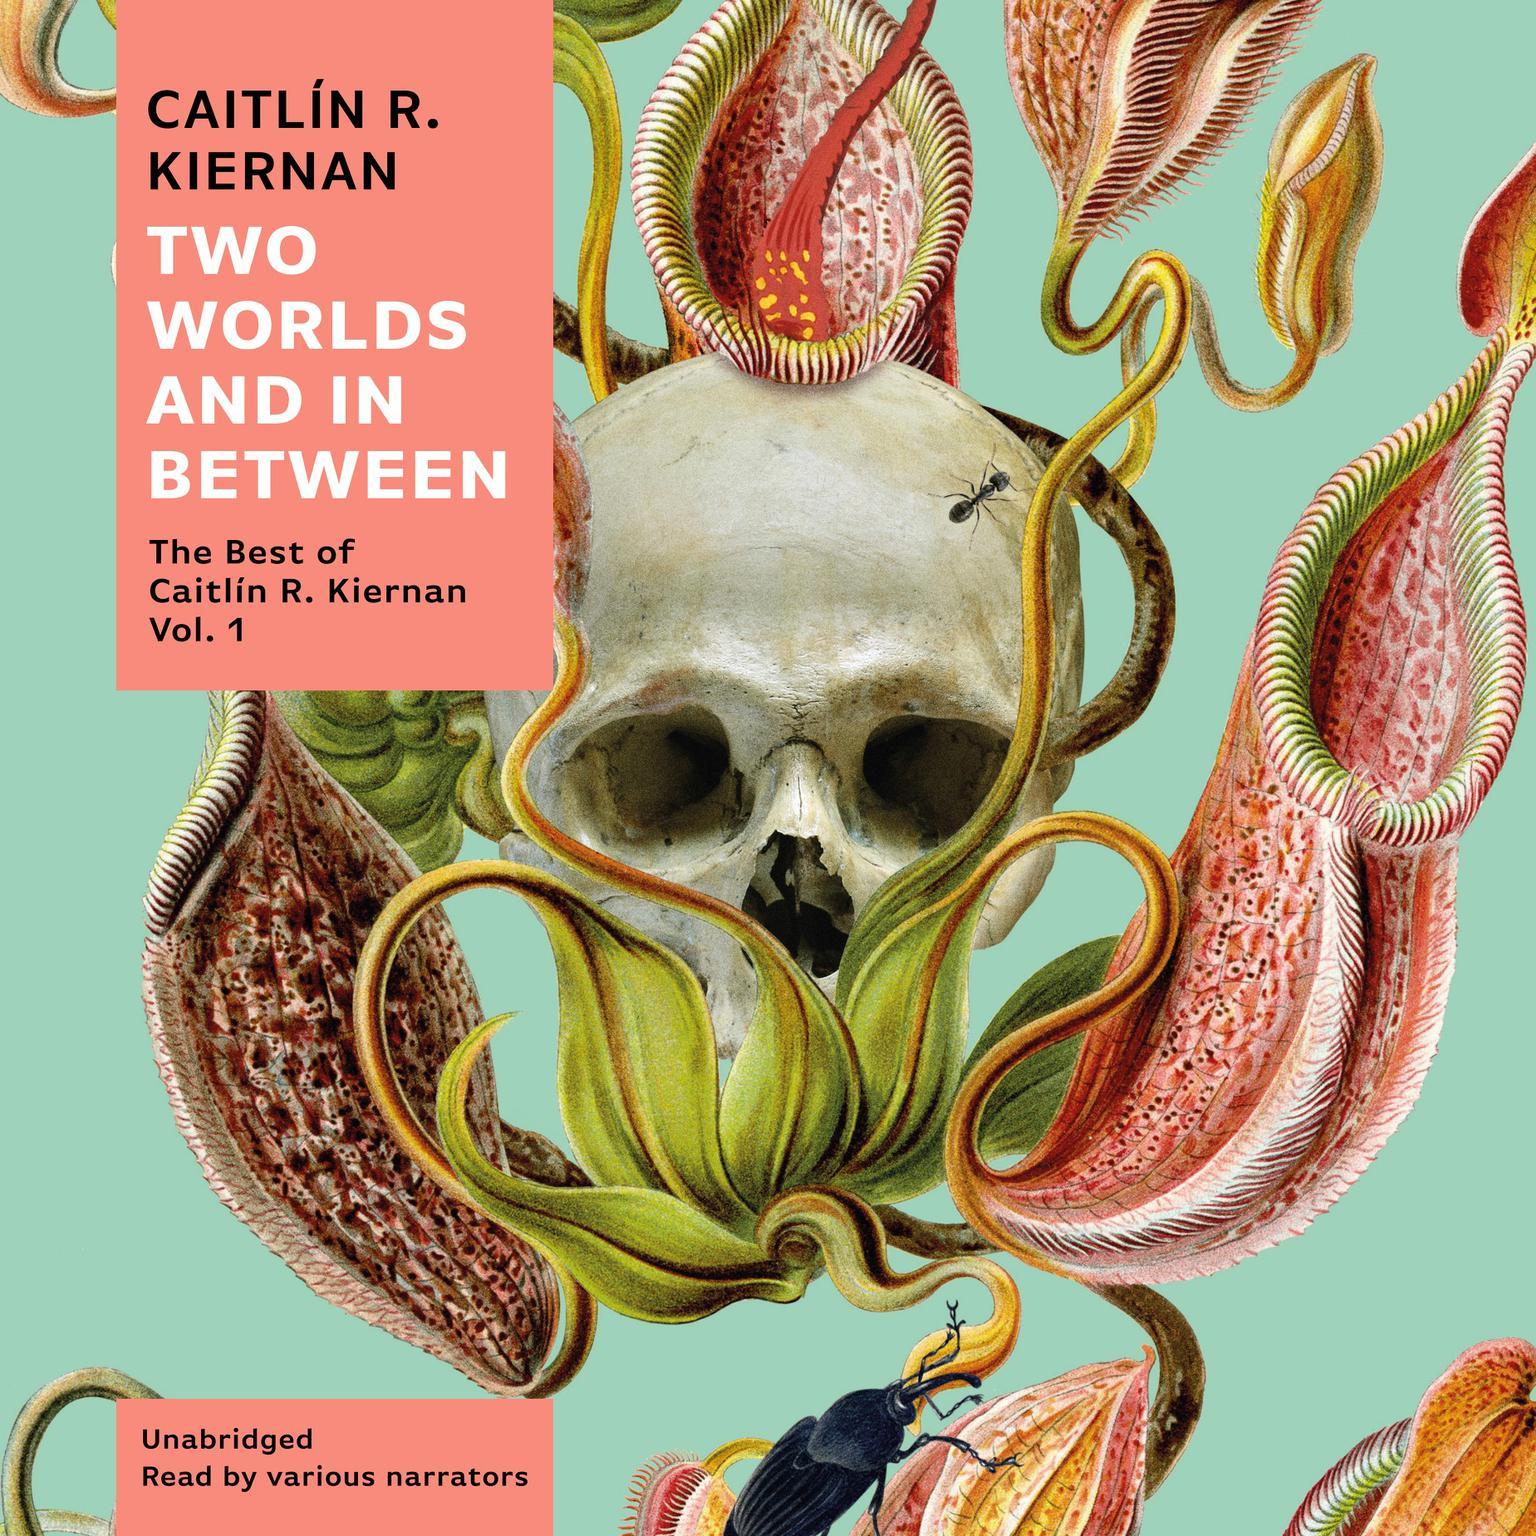 Two Worlds and In Between: The Best of Caitlín R. Kiernan, Vol. 1 Audiobook, by Caitlín R. Kiernan